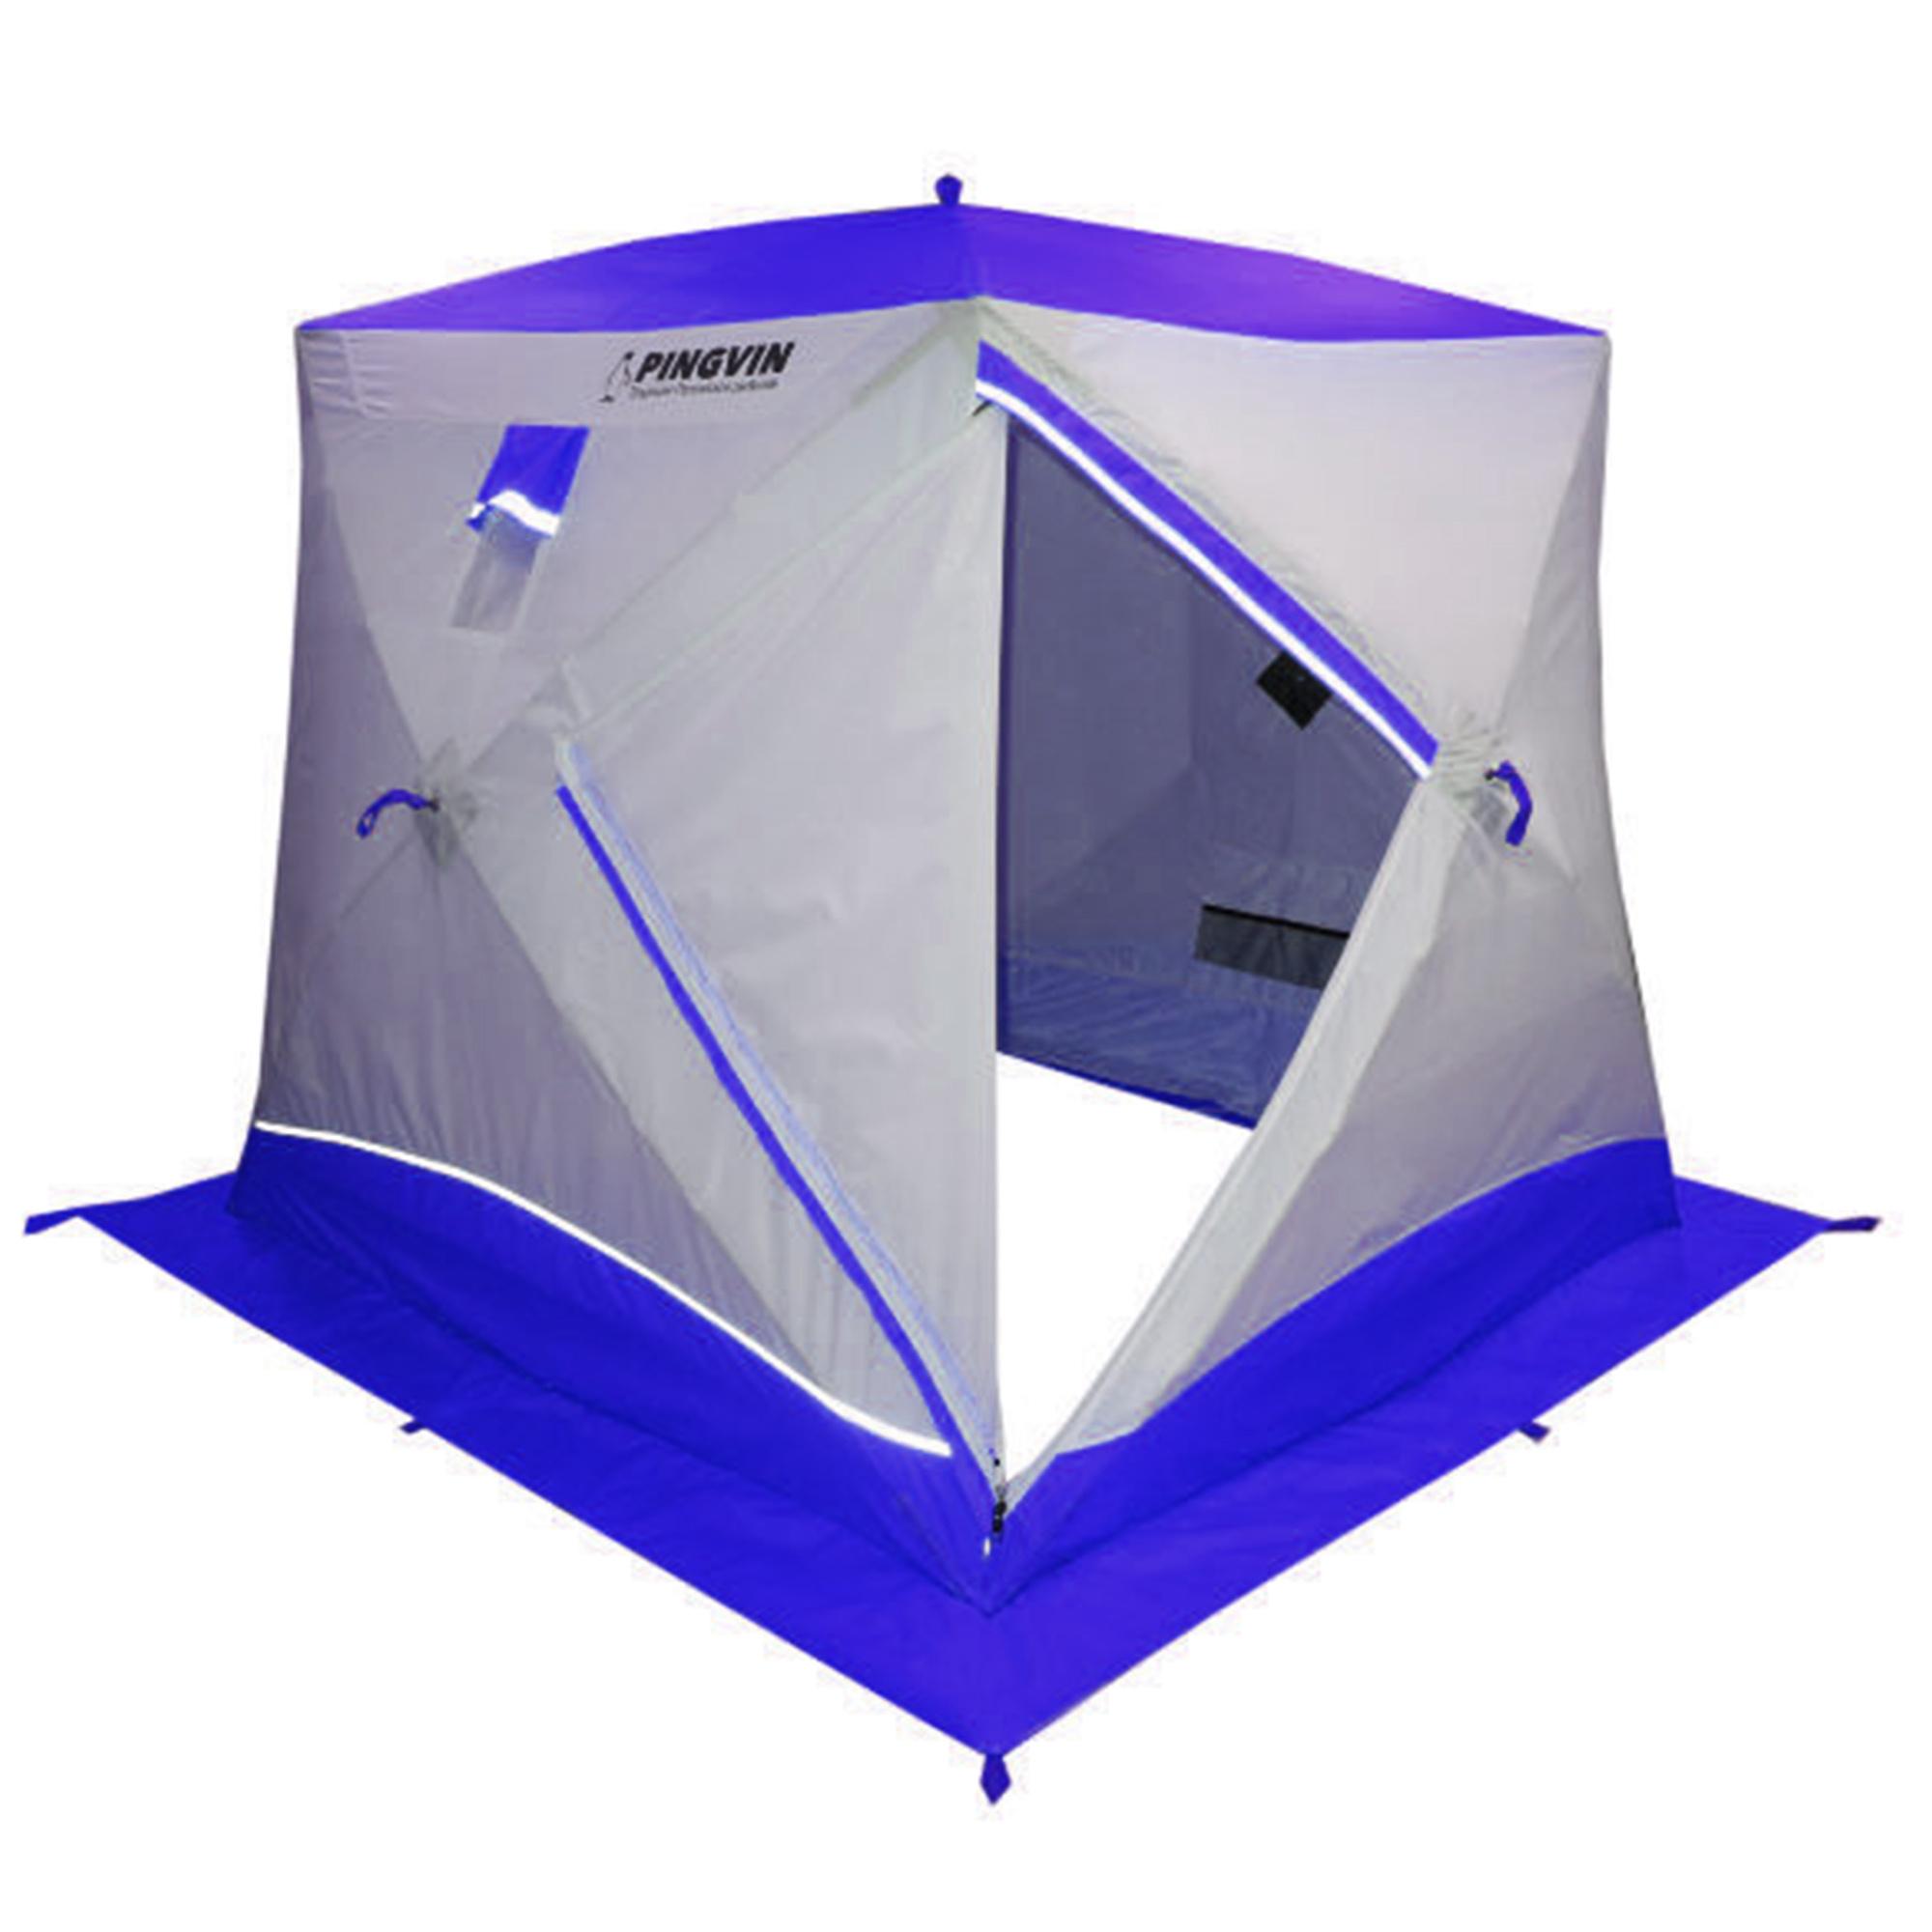 Палатка-куб ПИНГВИН Призма BRAND NEW (2-сл. 200*185), Палатки - арт. 1128470162